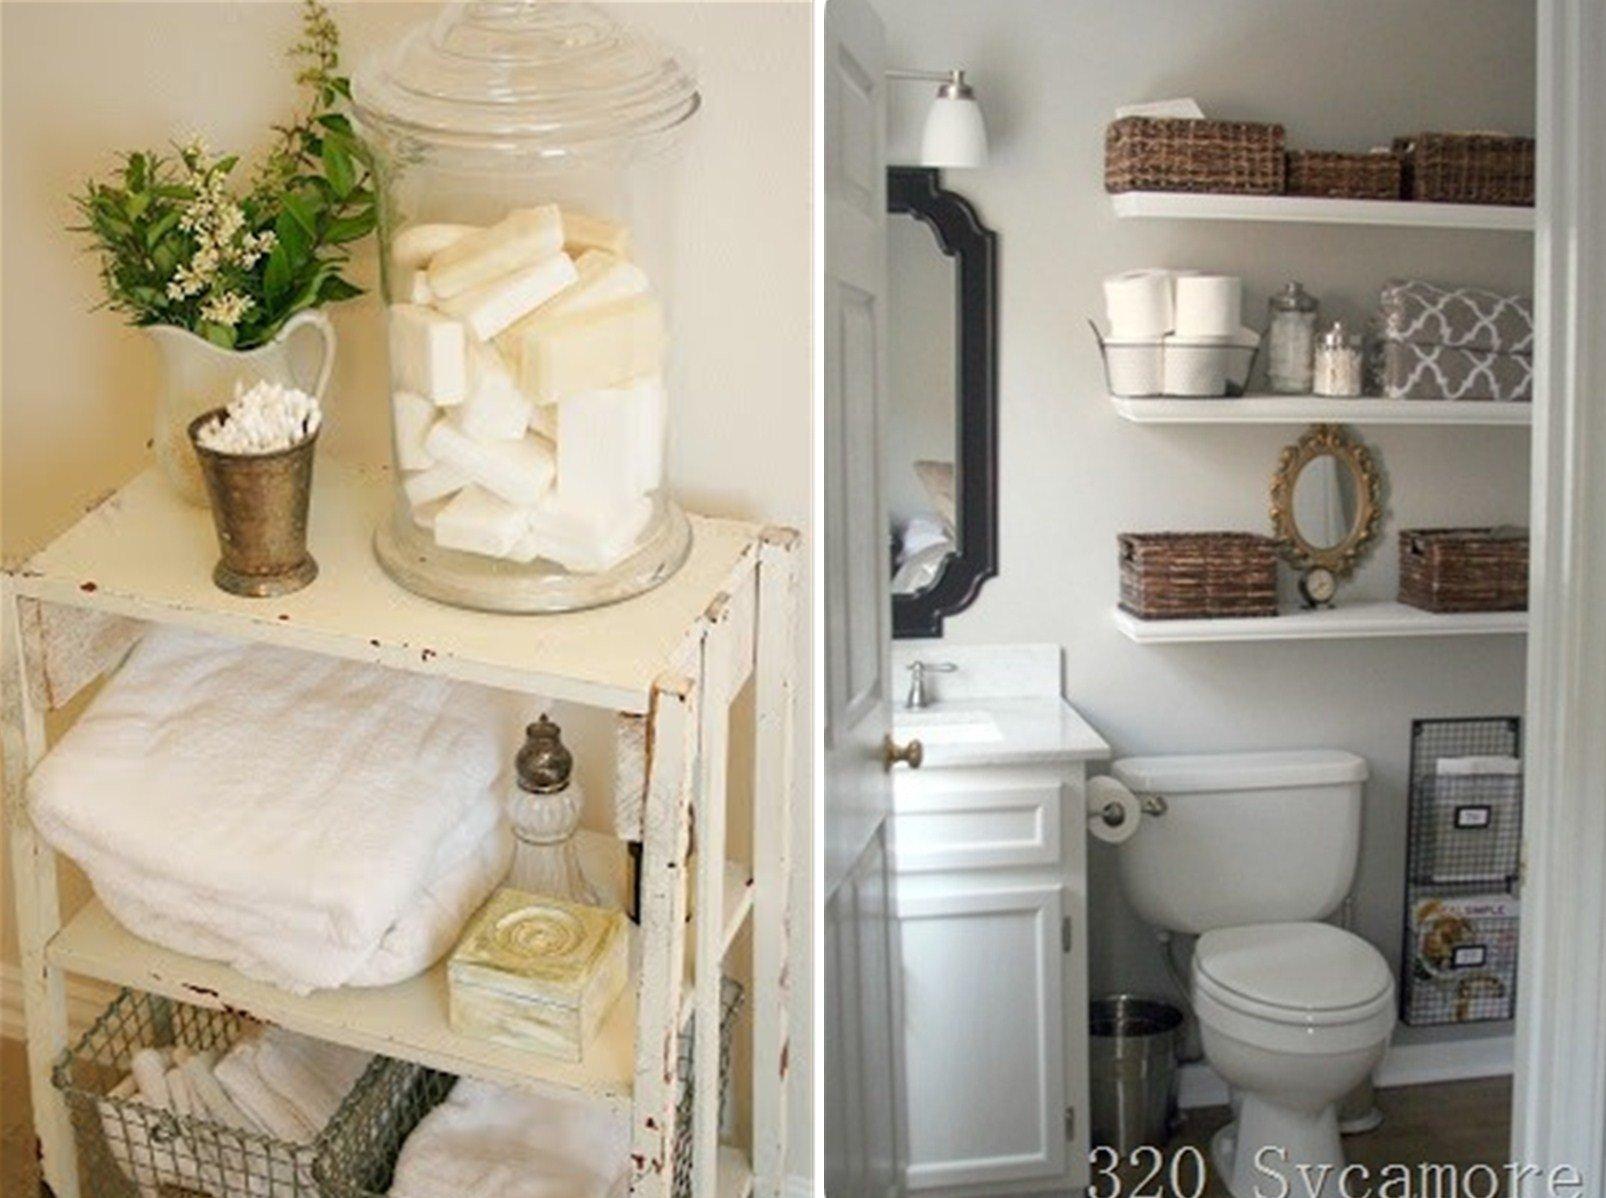 10 Stylish Ideas For Decorating A Bathroom ideas collection bathroom cheap bathrooms master bathroom decorating 2020